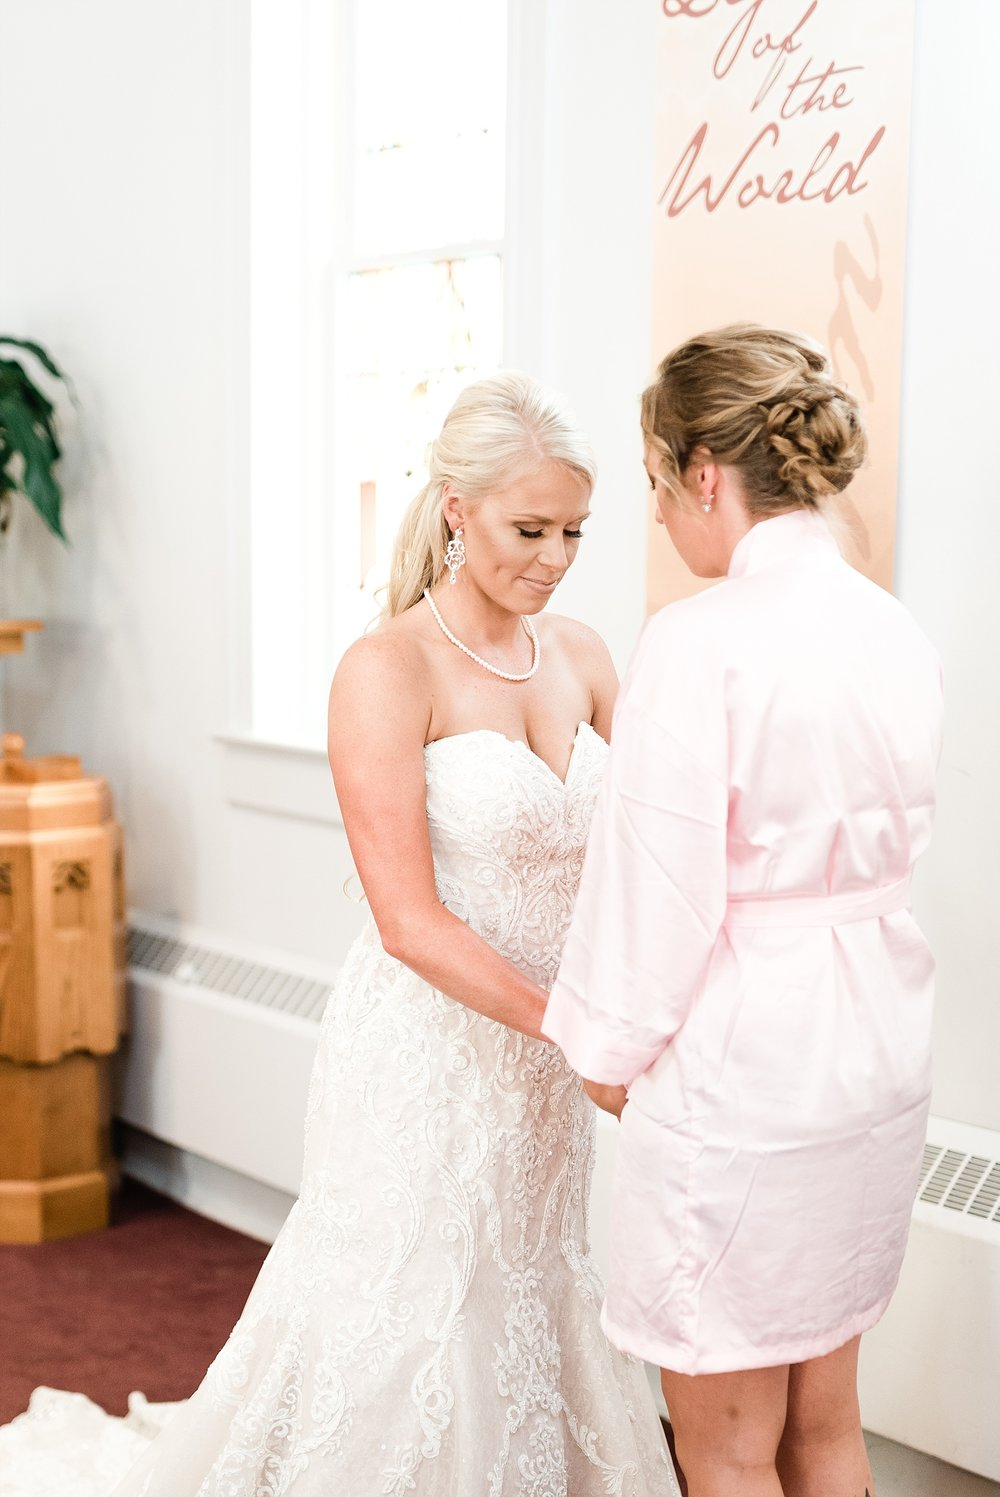 Alan and Heather Horn Wedding by Kelsi Kliethermes Photography Associate - Rachel_0030.jpg